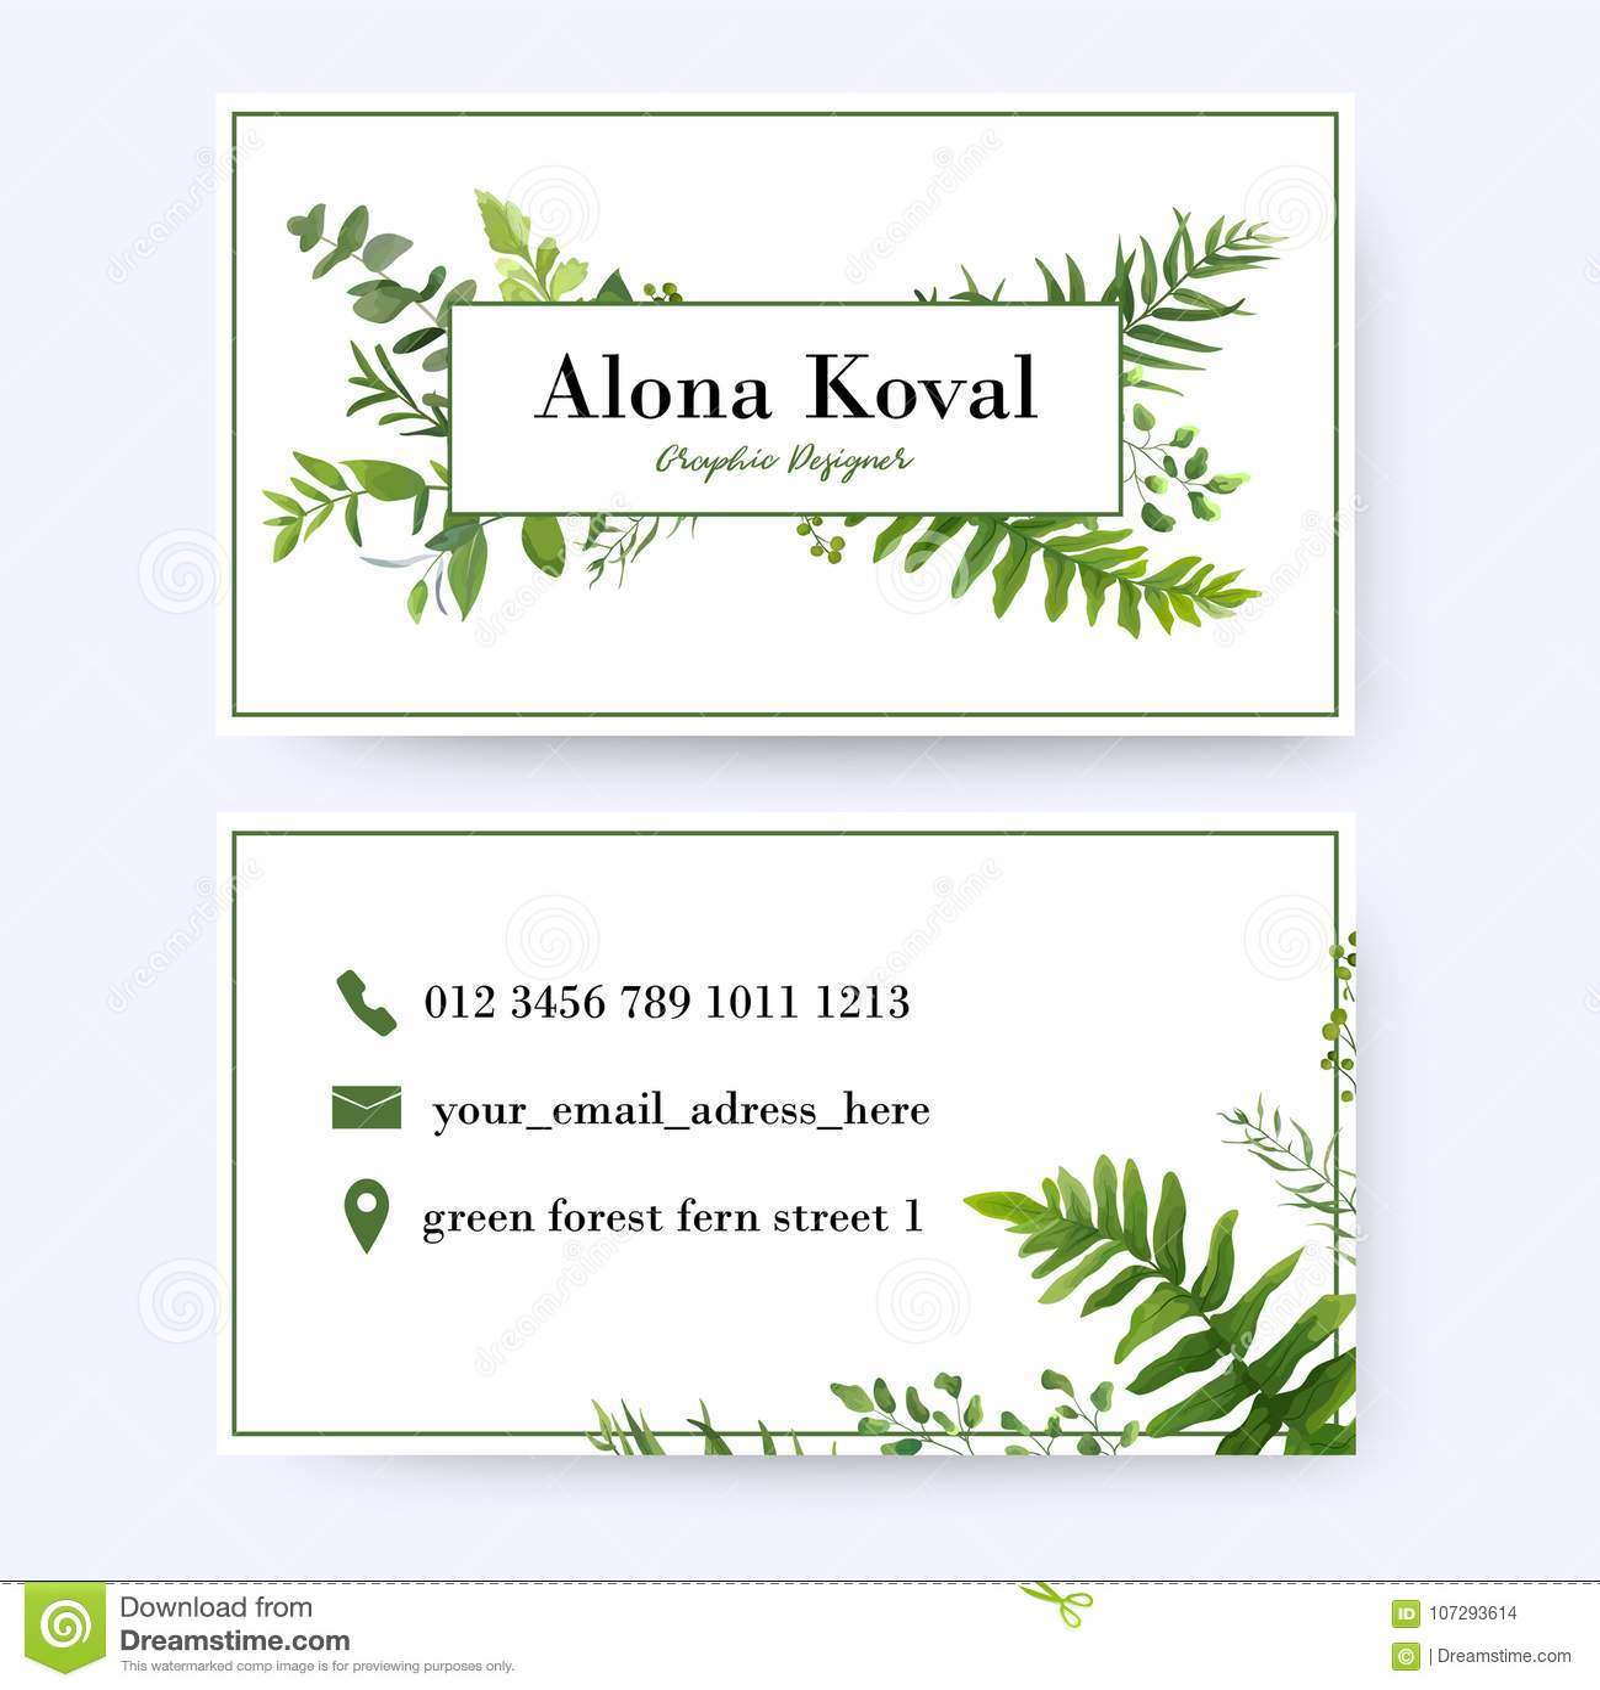 Floral Business Card Design  Vintage, Rustic Eucalyptus Green He